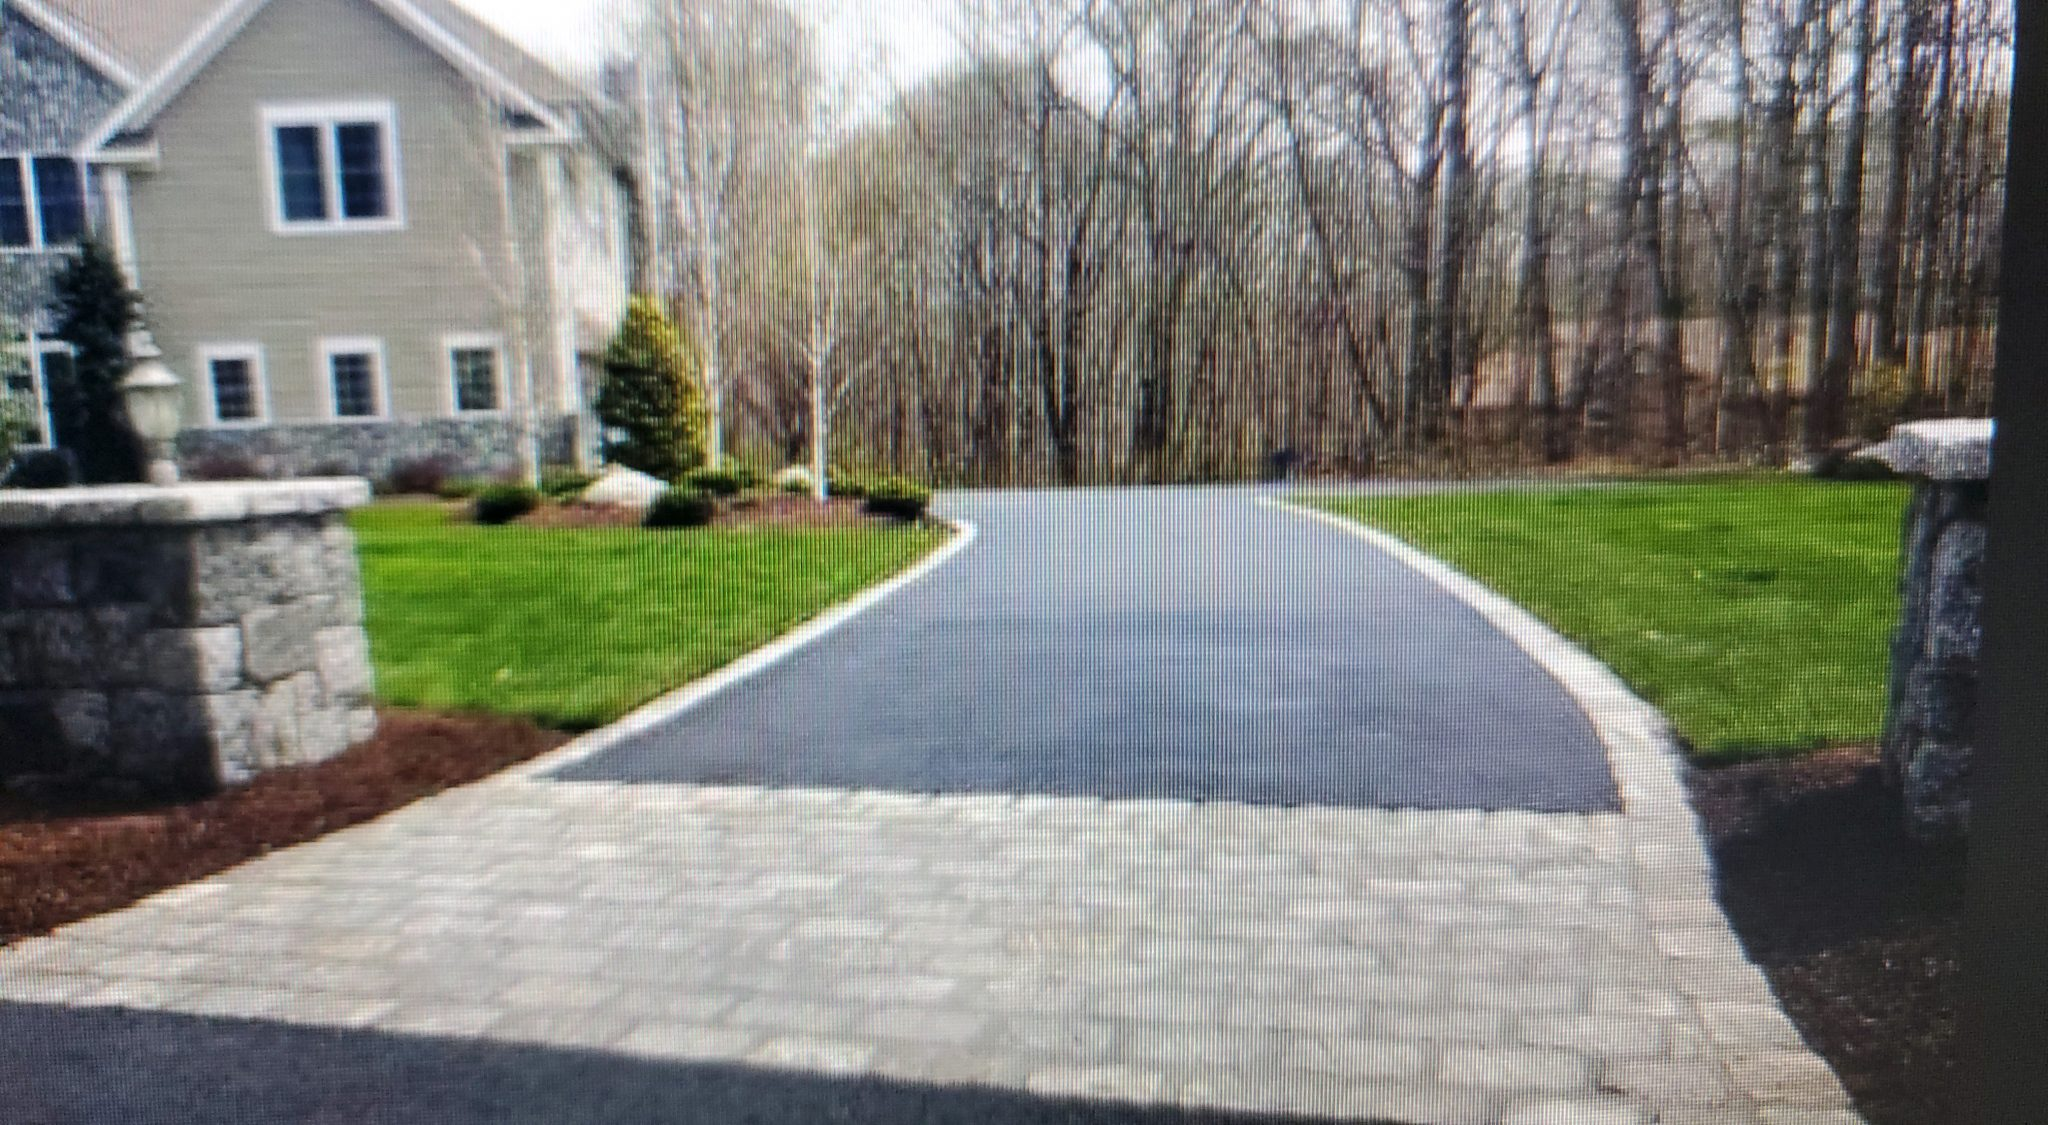 Paver and Asphalt Driveway